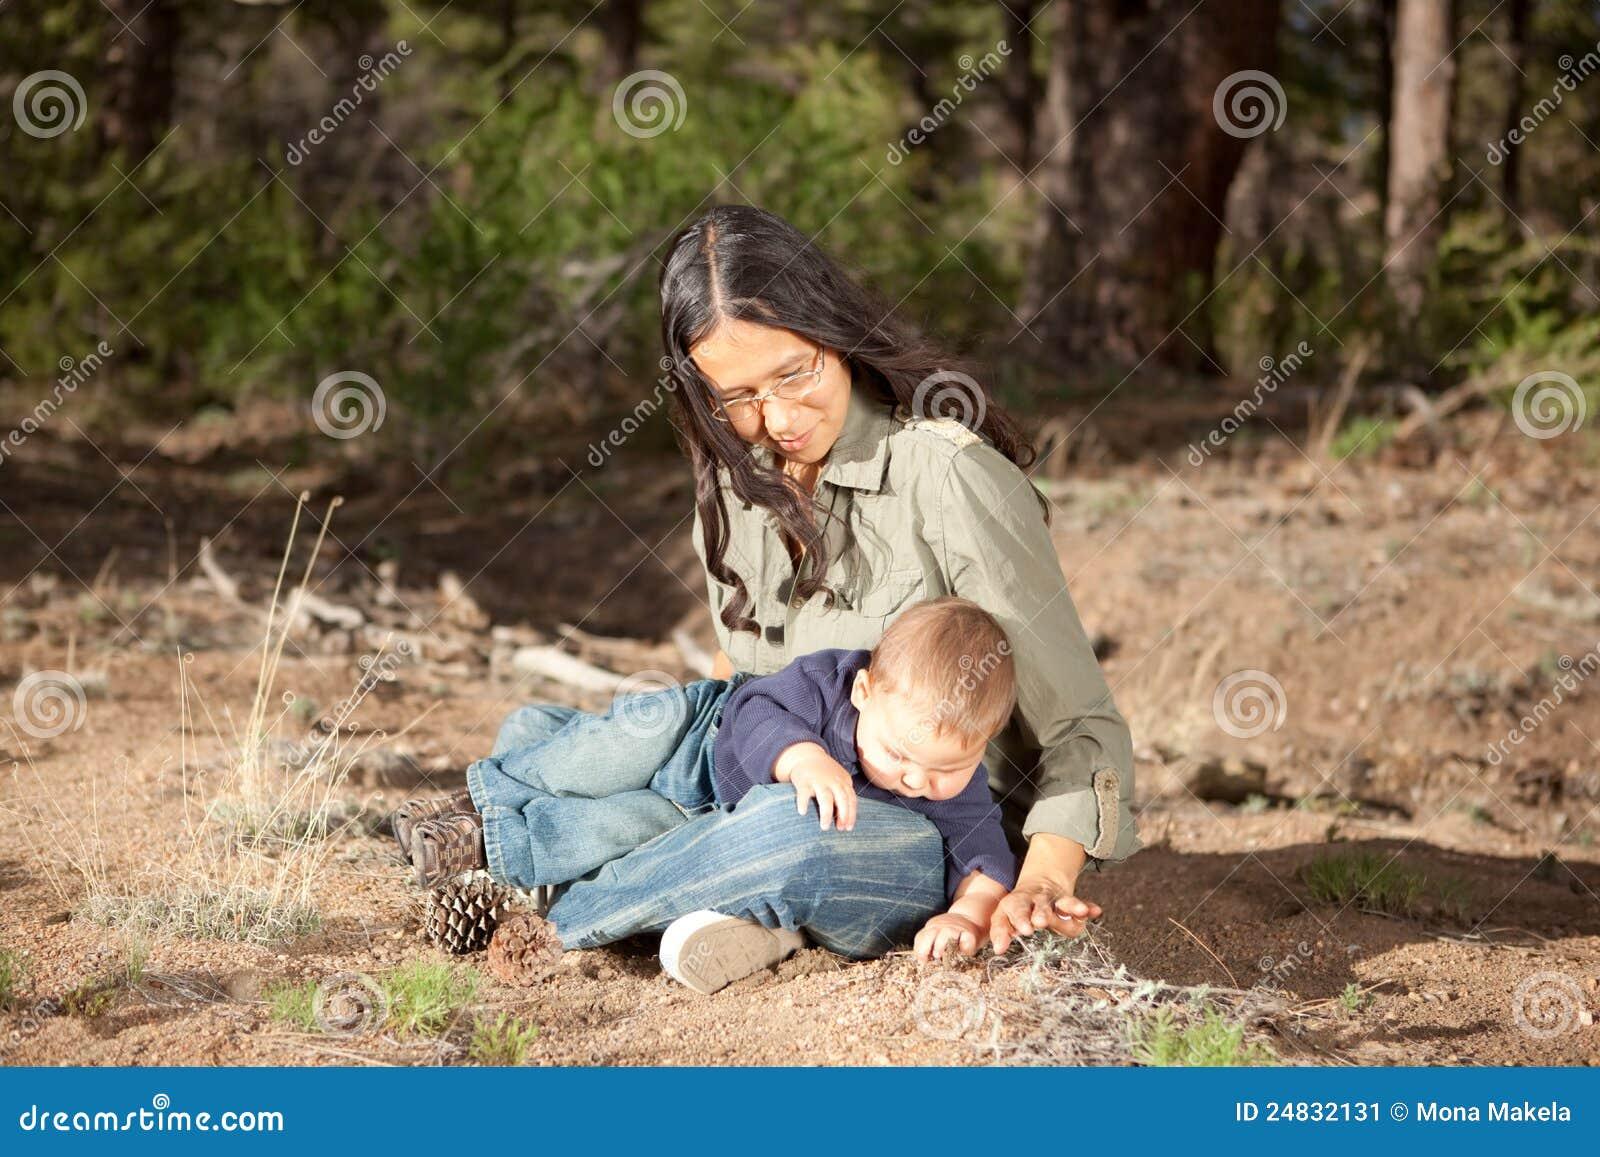 Матушка и сынок фото 304-864